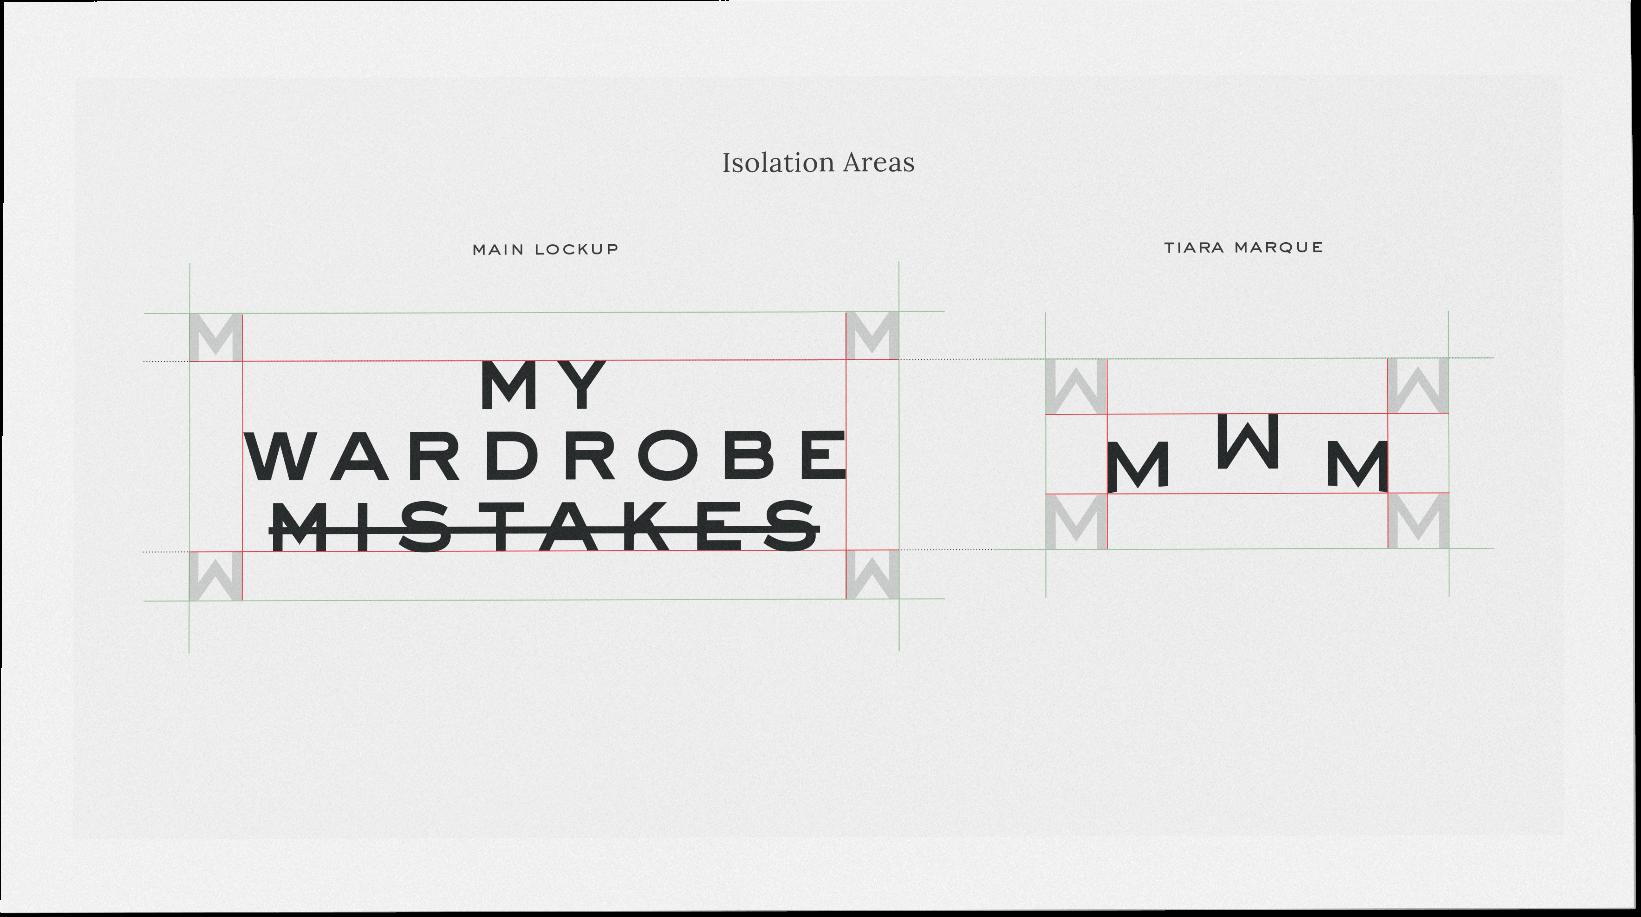 mwm-s-1-iso